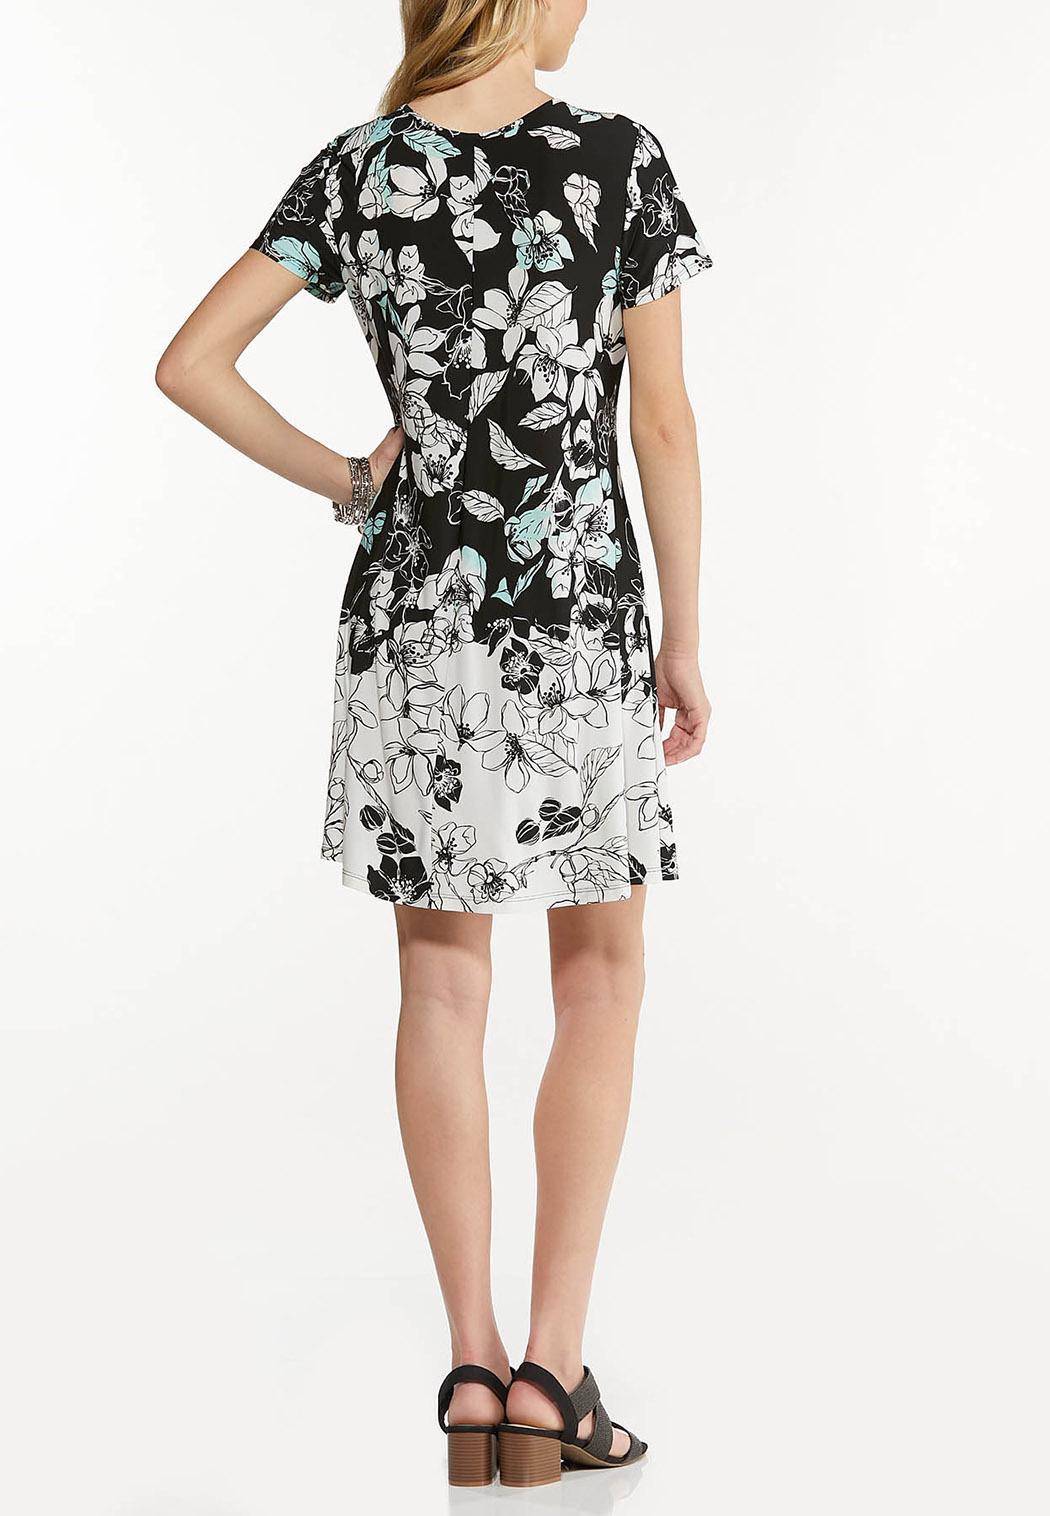 Plus Size Stretchy Floral Swing Dress (Item #44541656)